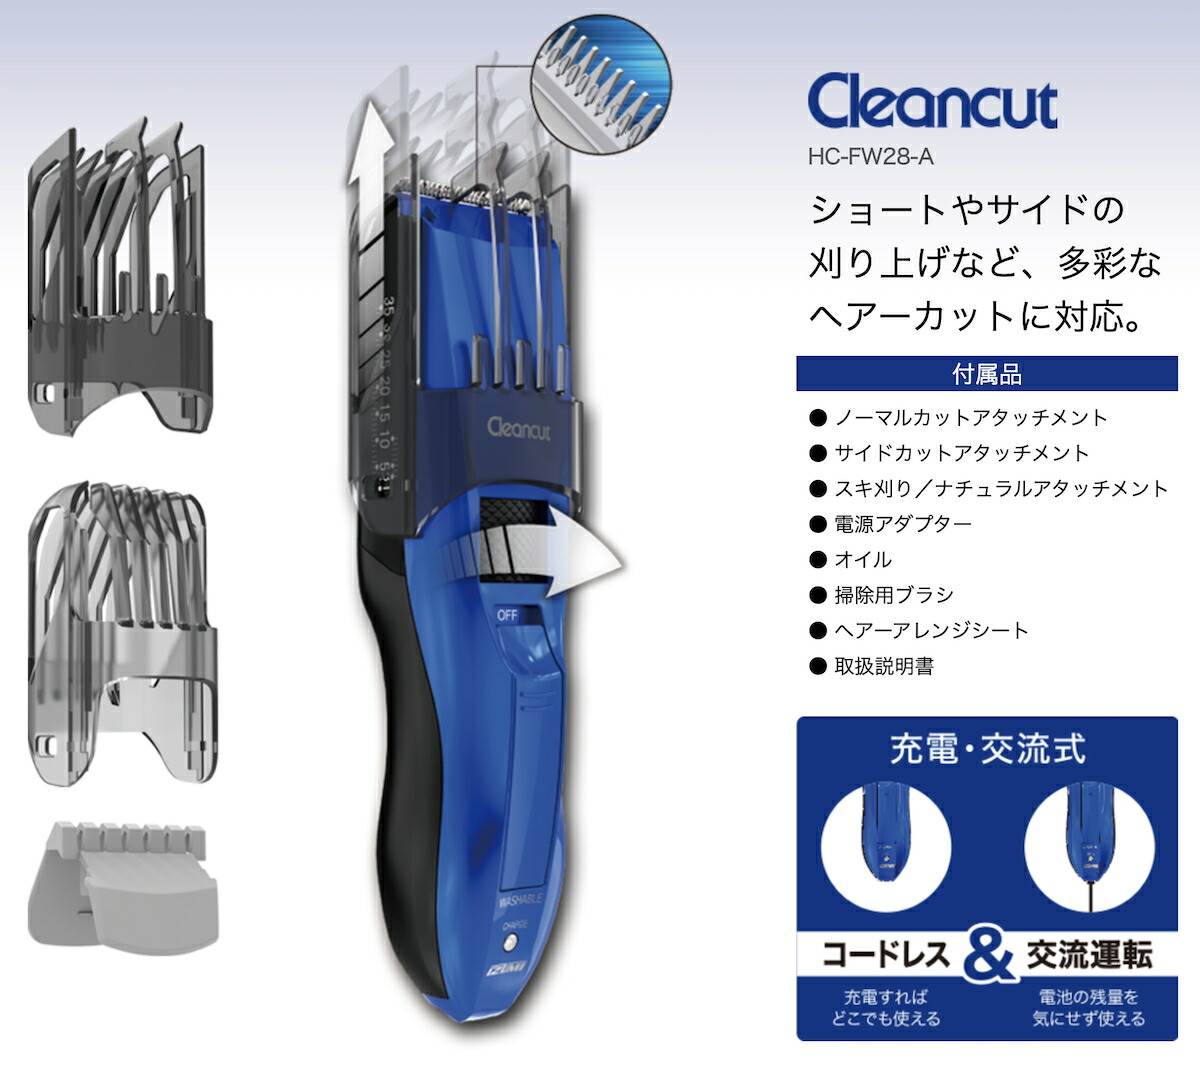 Cleancut HC-FW28-A